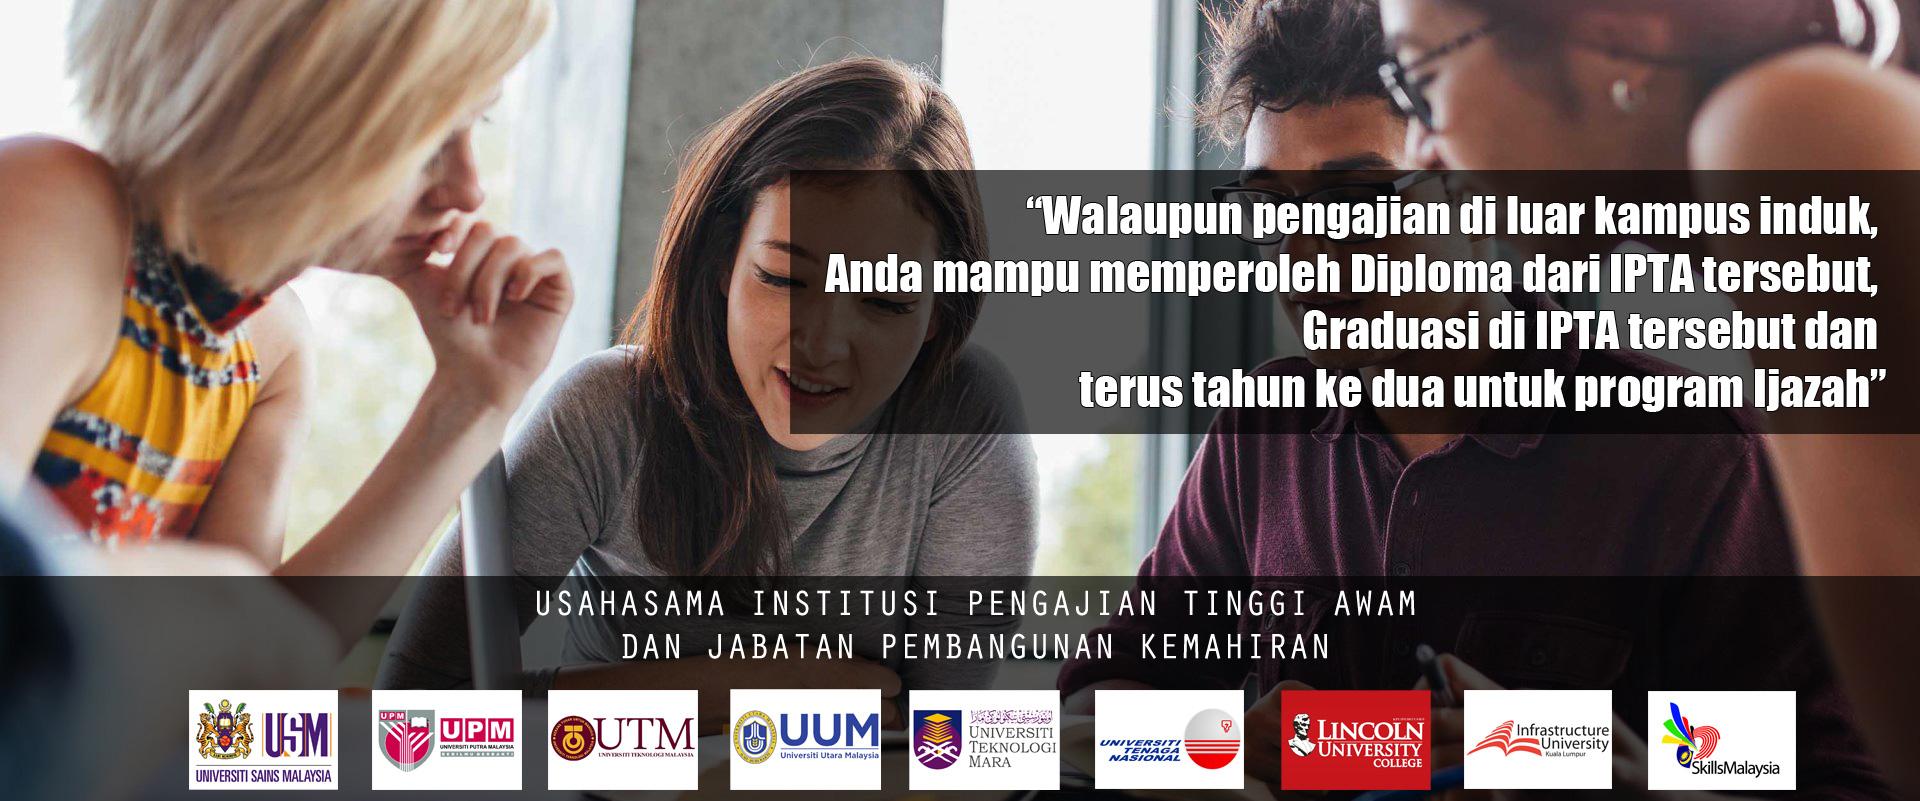 Daftar Ipt: Pilihan Program Usahama IPTA